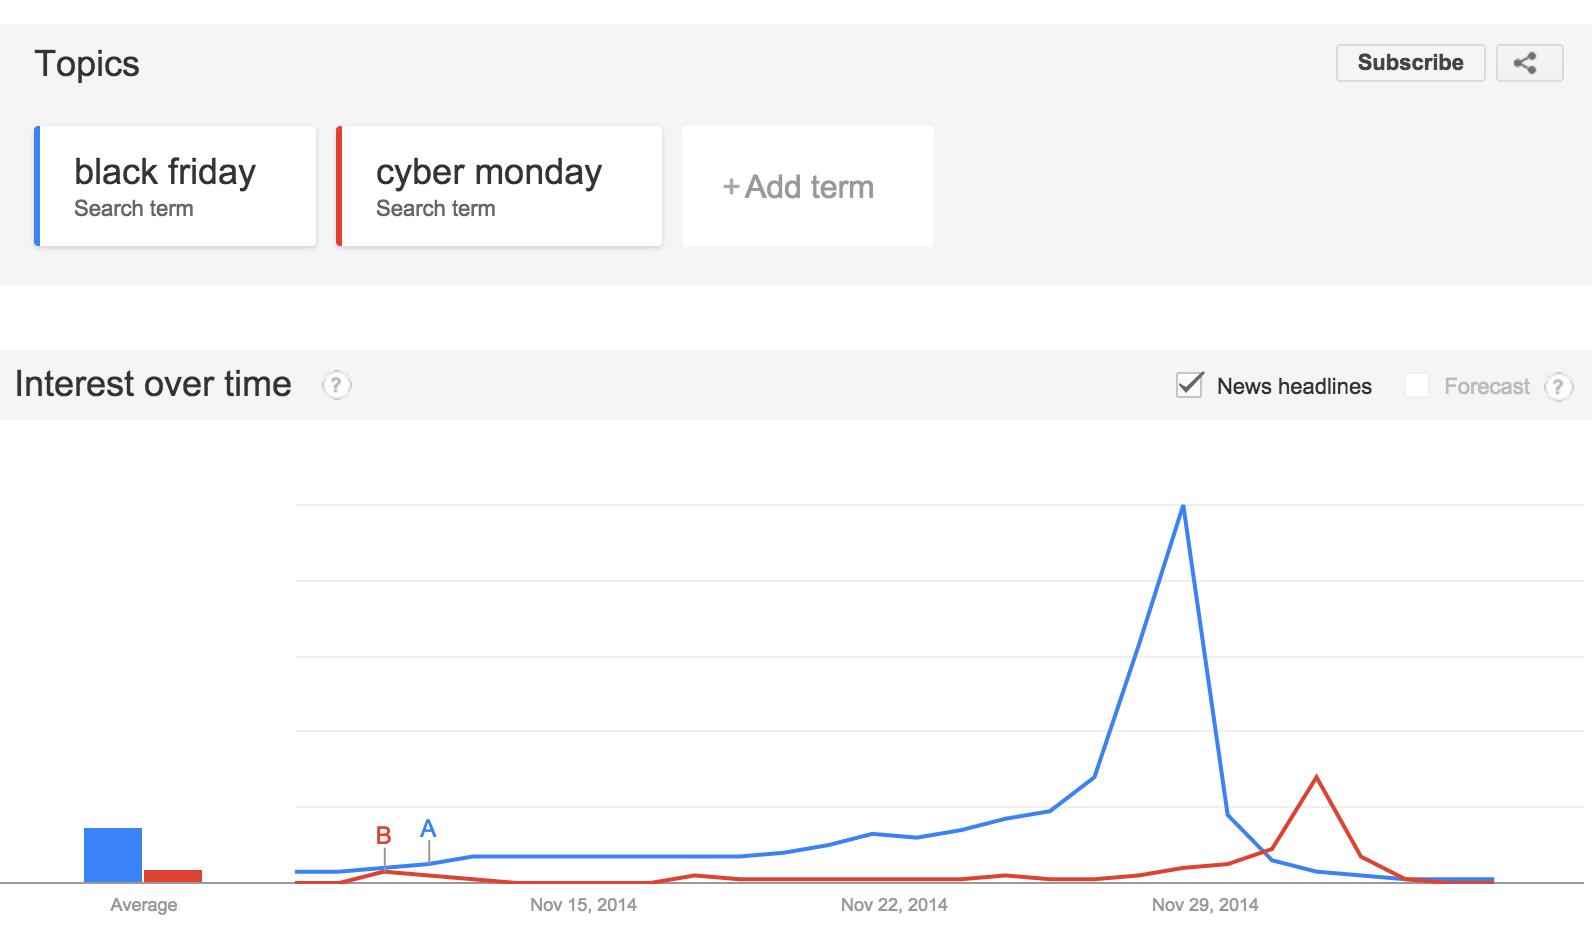 google-trends-black-friday-vs-cyber-monday